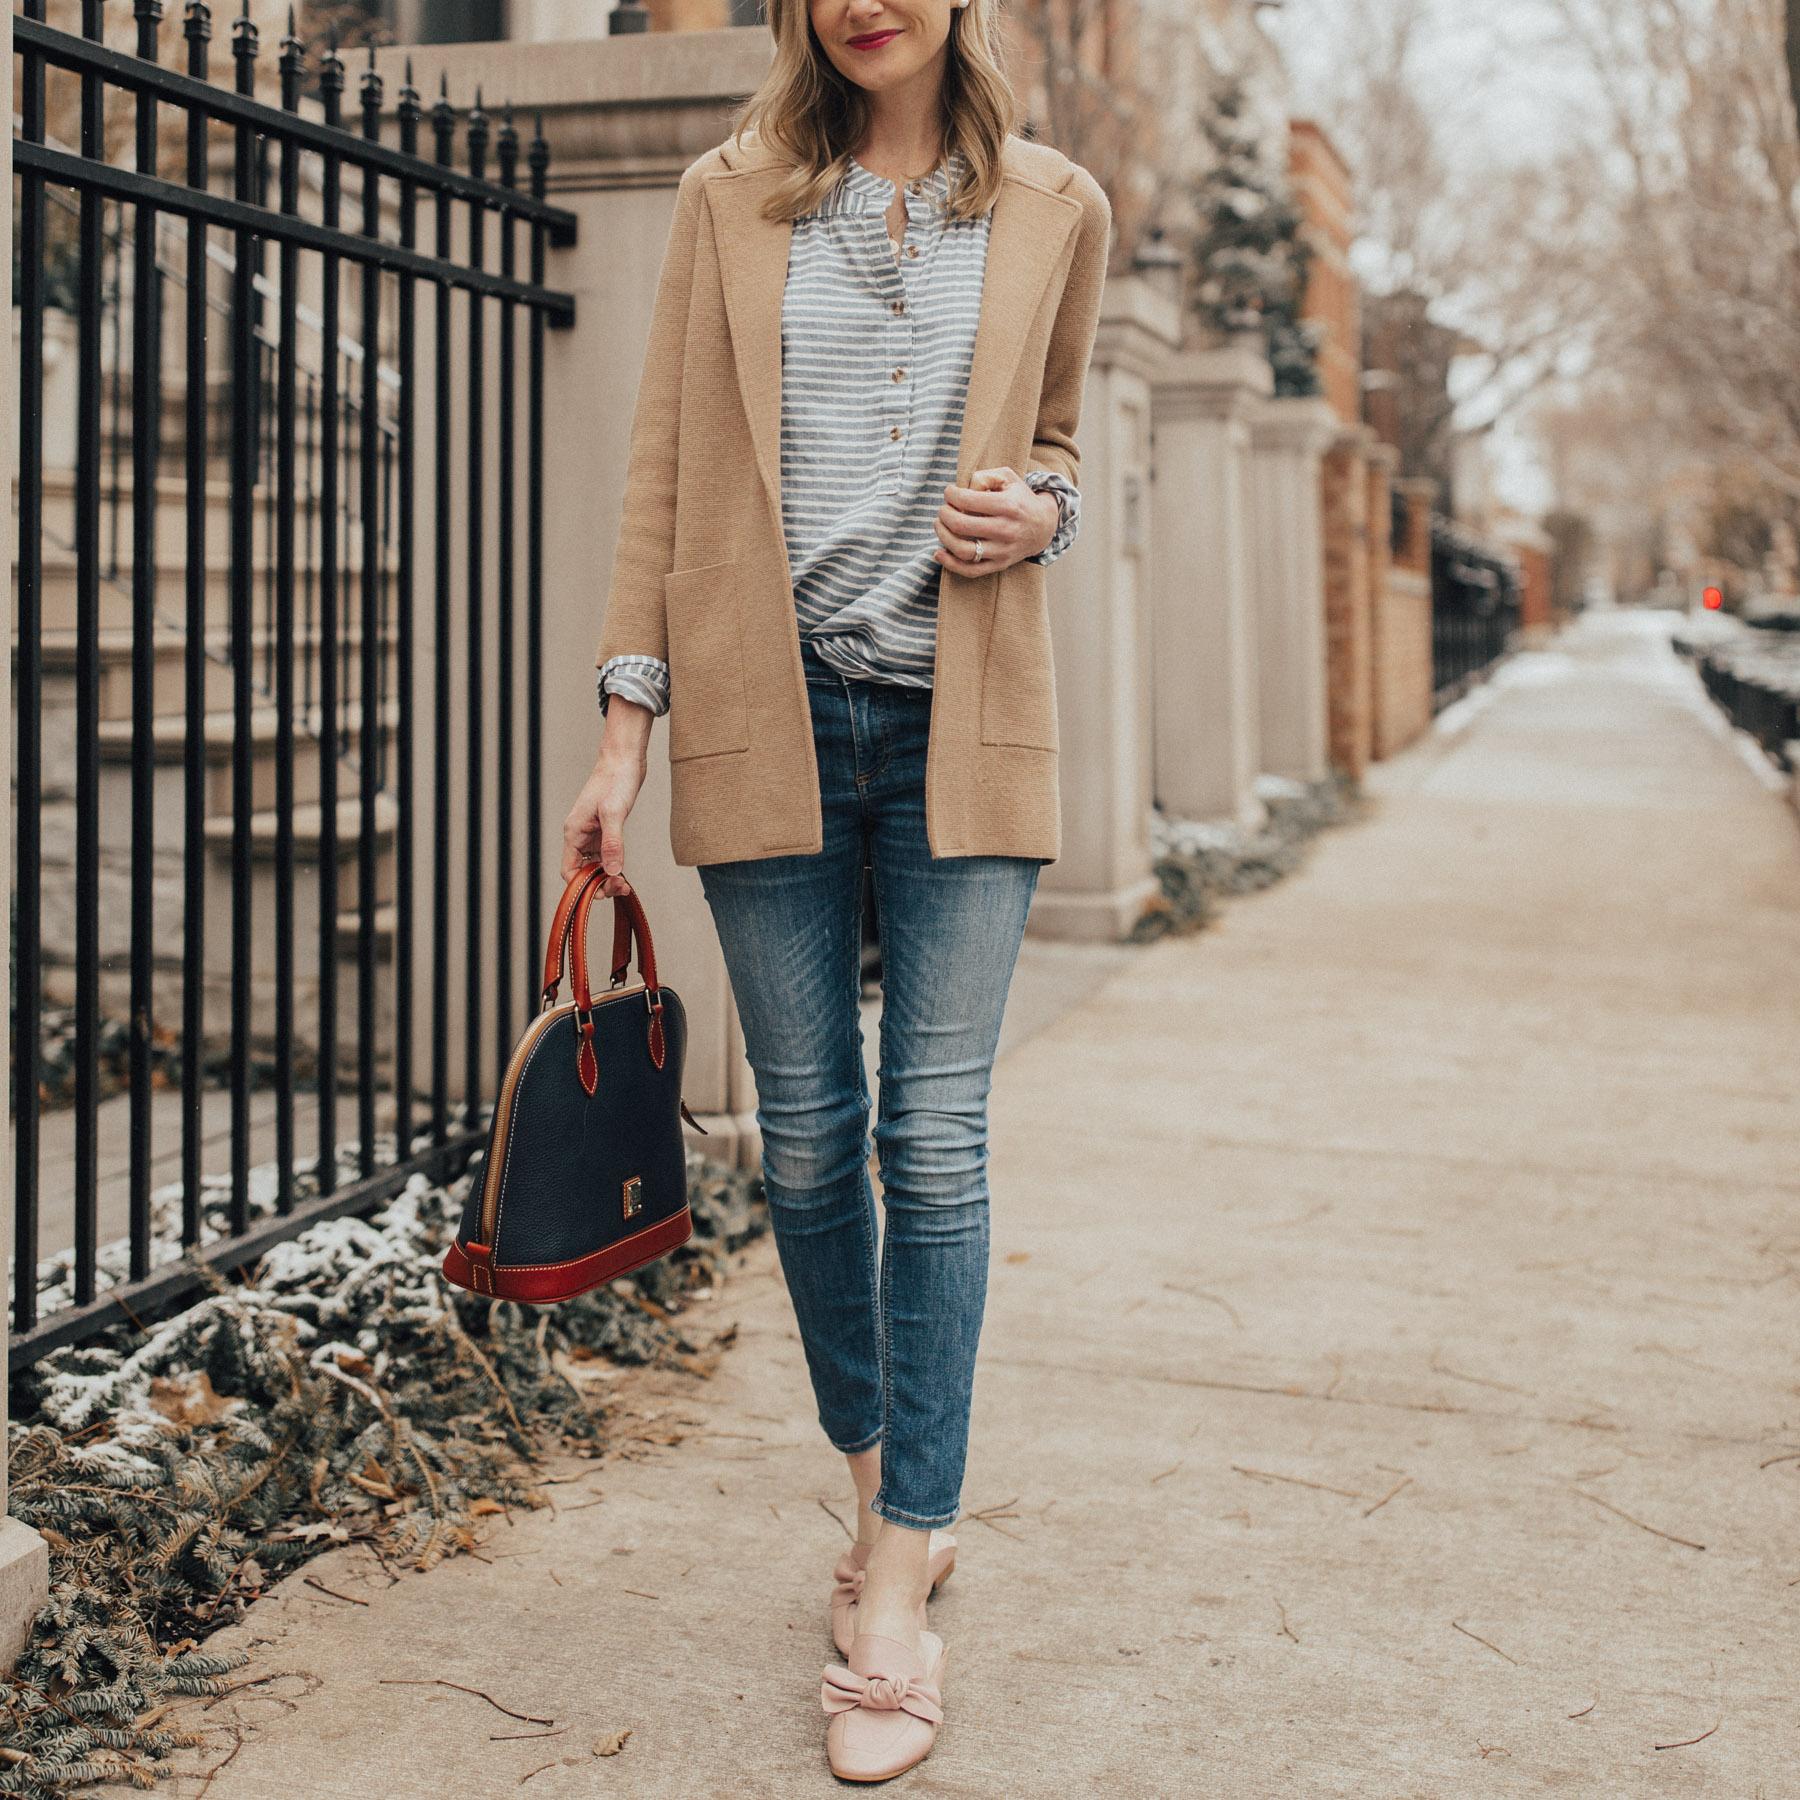 Why I Went Darker A Jcrew Sweater Blazer Kelly In The City